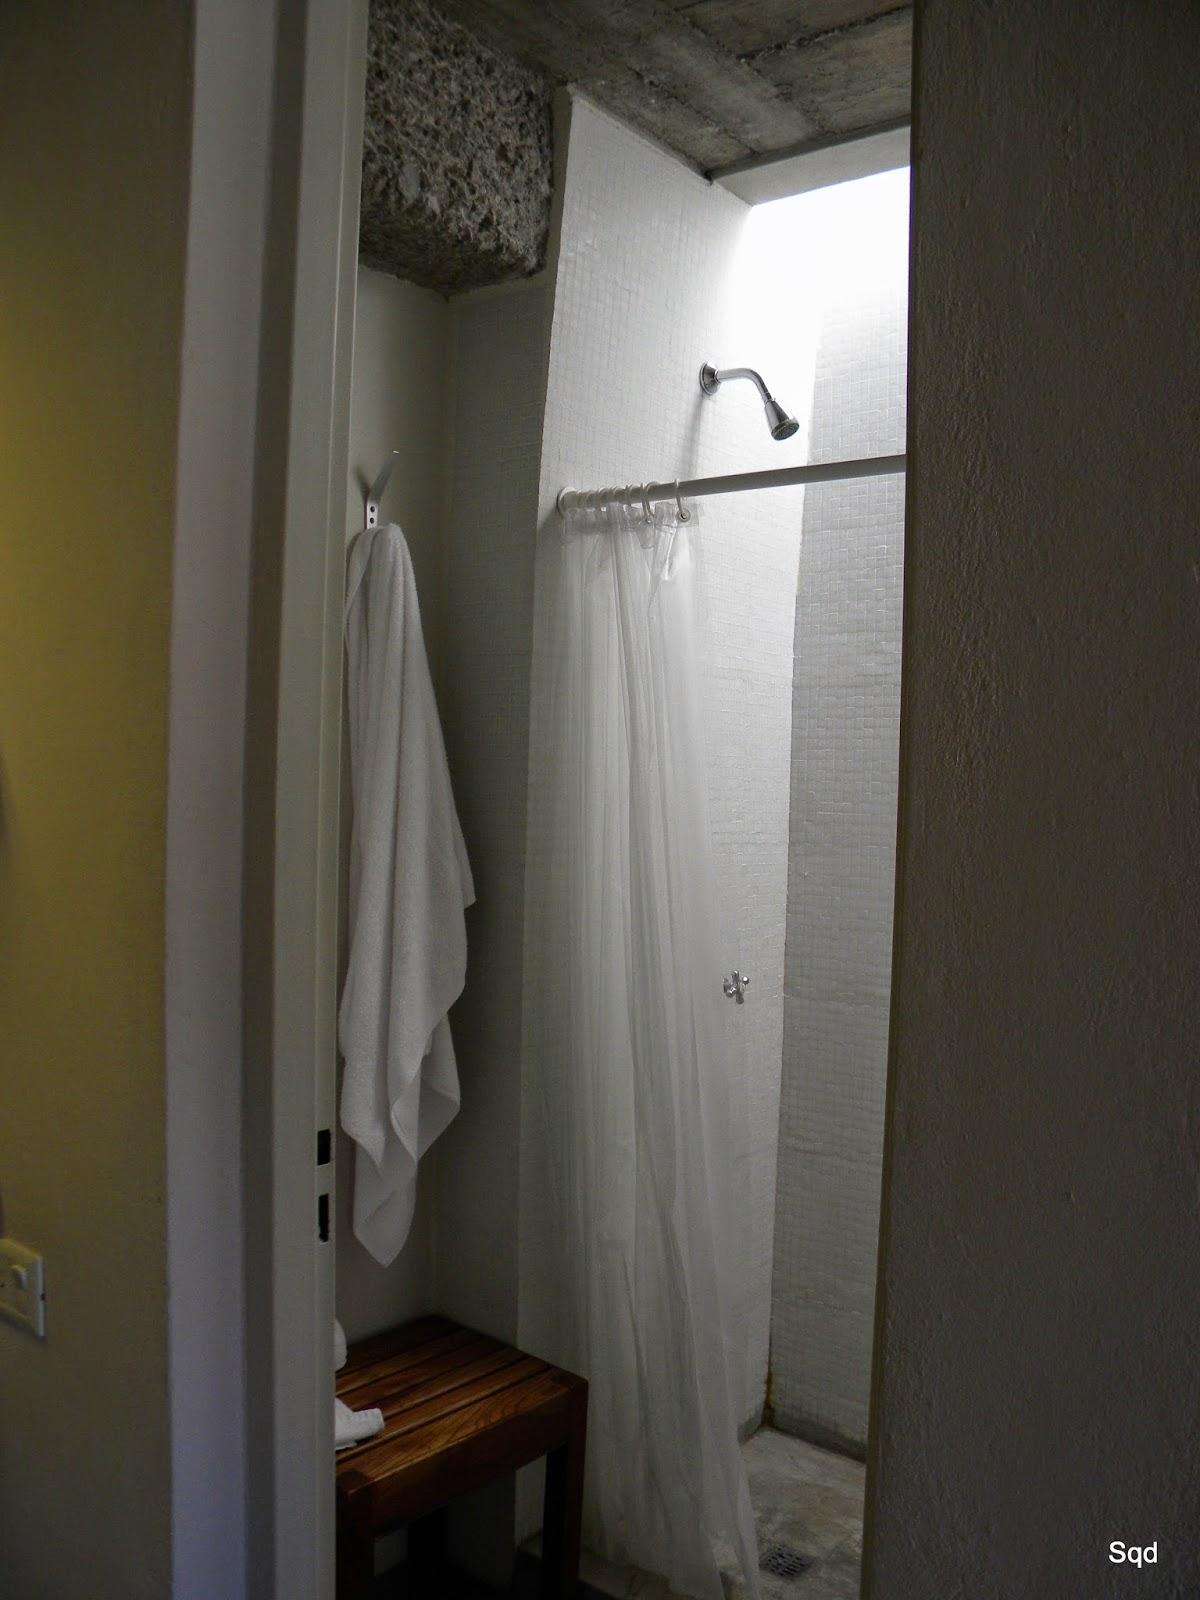 baño compartimentado